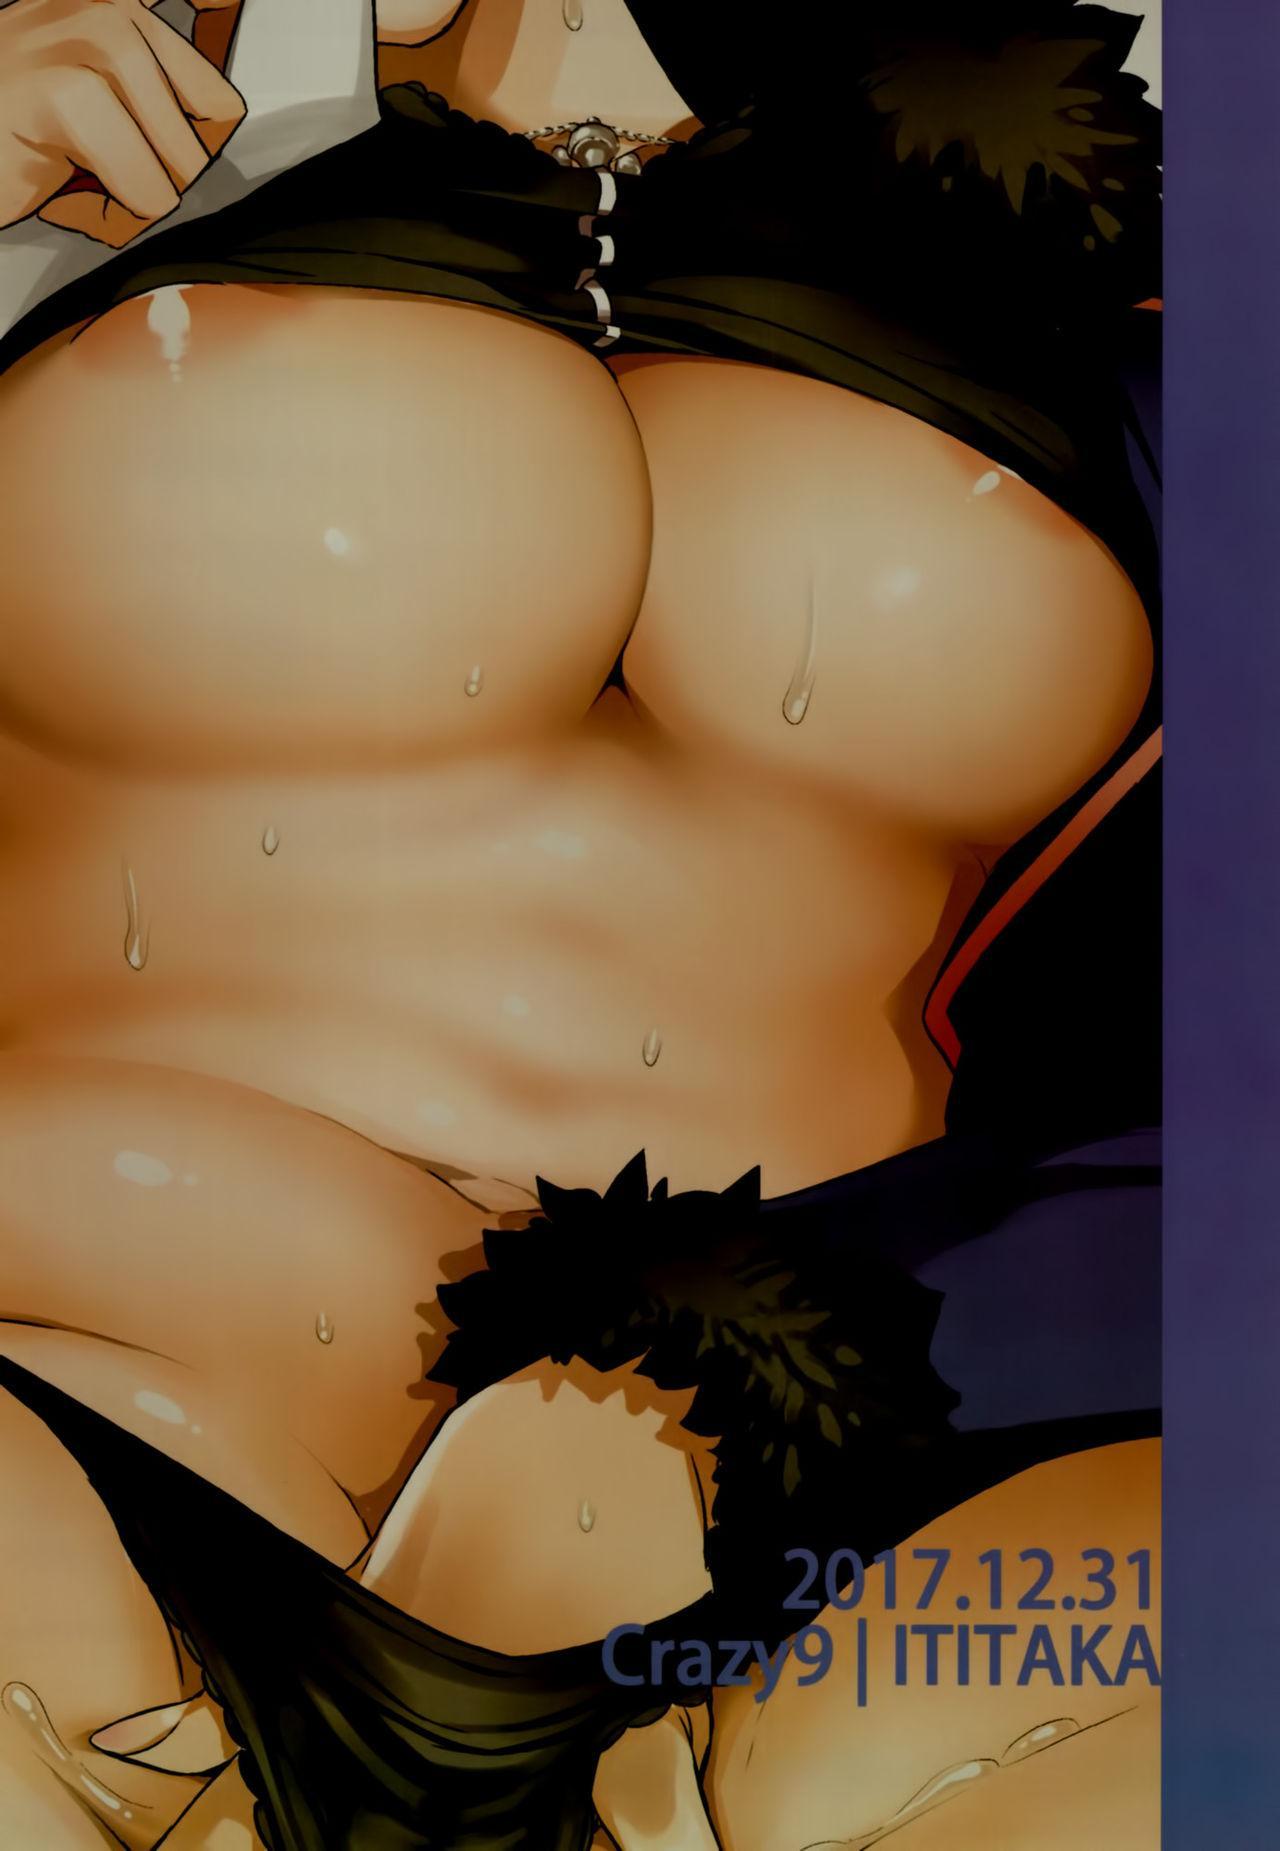 (C93) [Crazy9 (Ichitaka)] C9-32 Jeanne Alter-chan to Hatsujou | Getting Frisky with Little Miss Jeanne Alter (Fate/Grand Order) [English] {darknight} 26